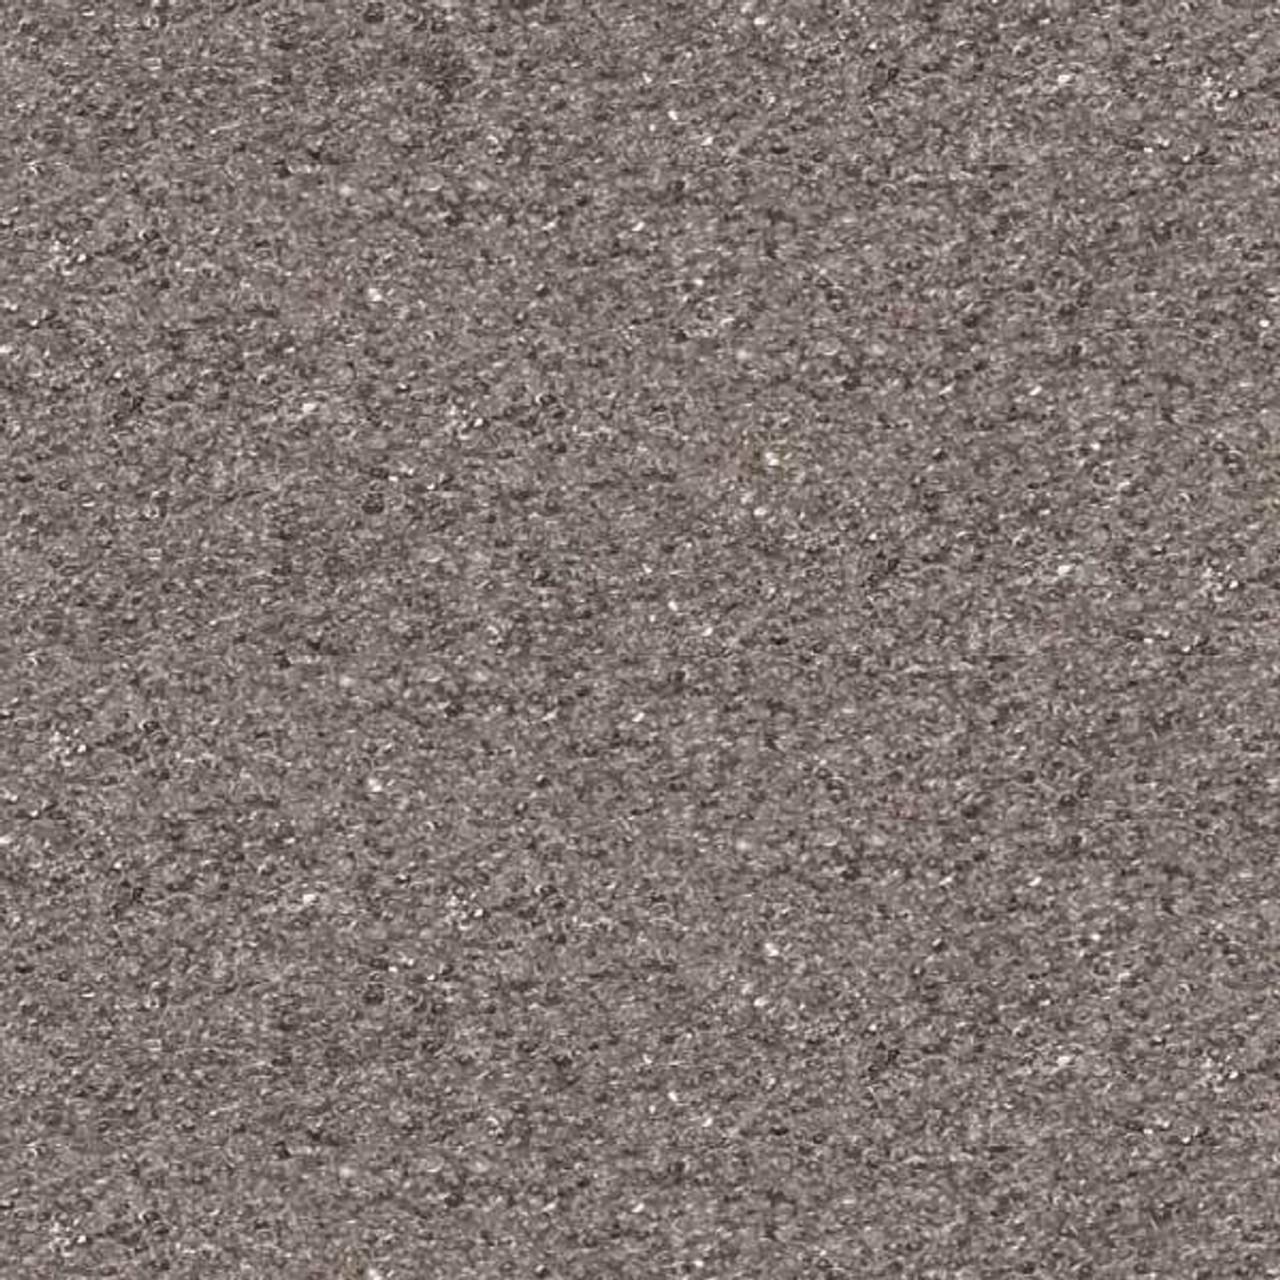 Bostik Bostik Dimension Reflective Grout 670 Moonstone